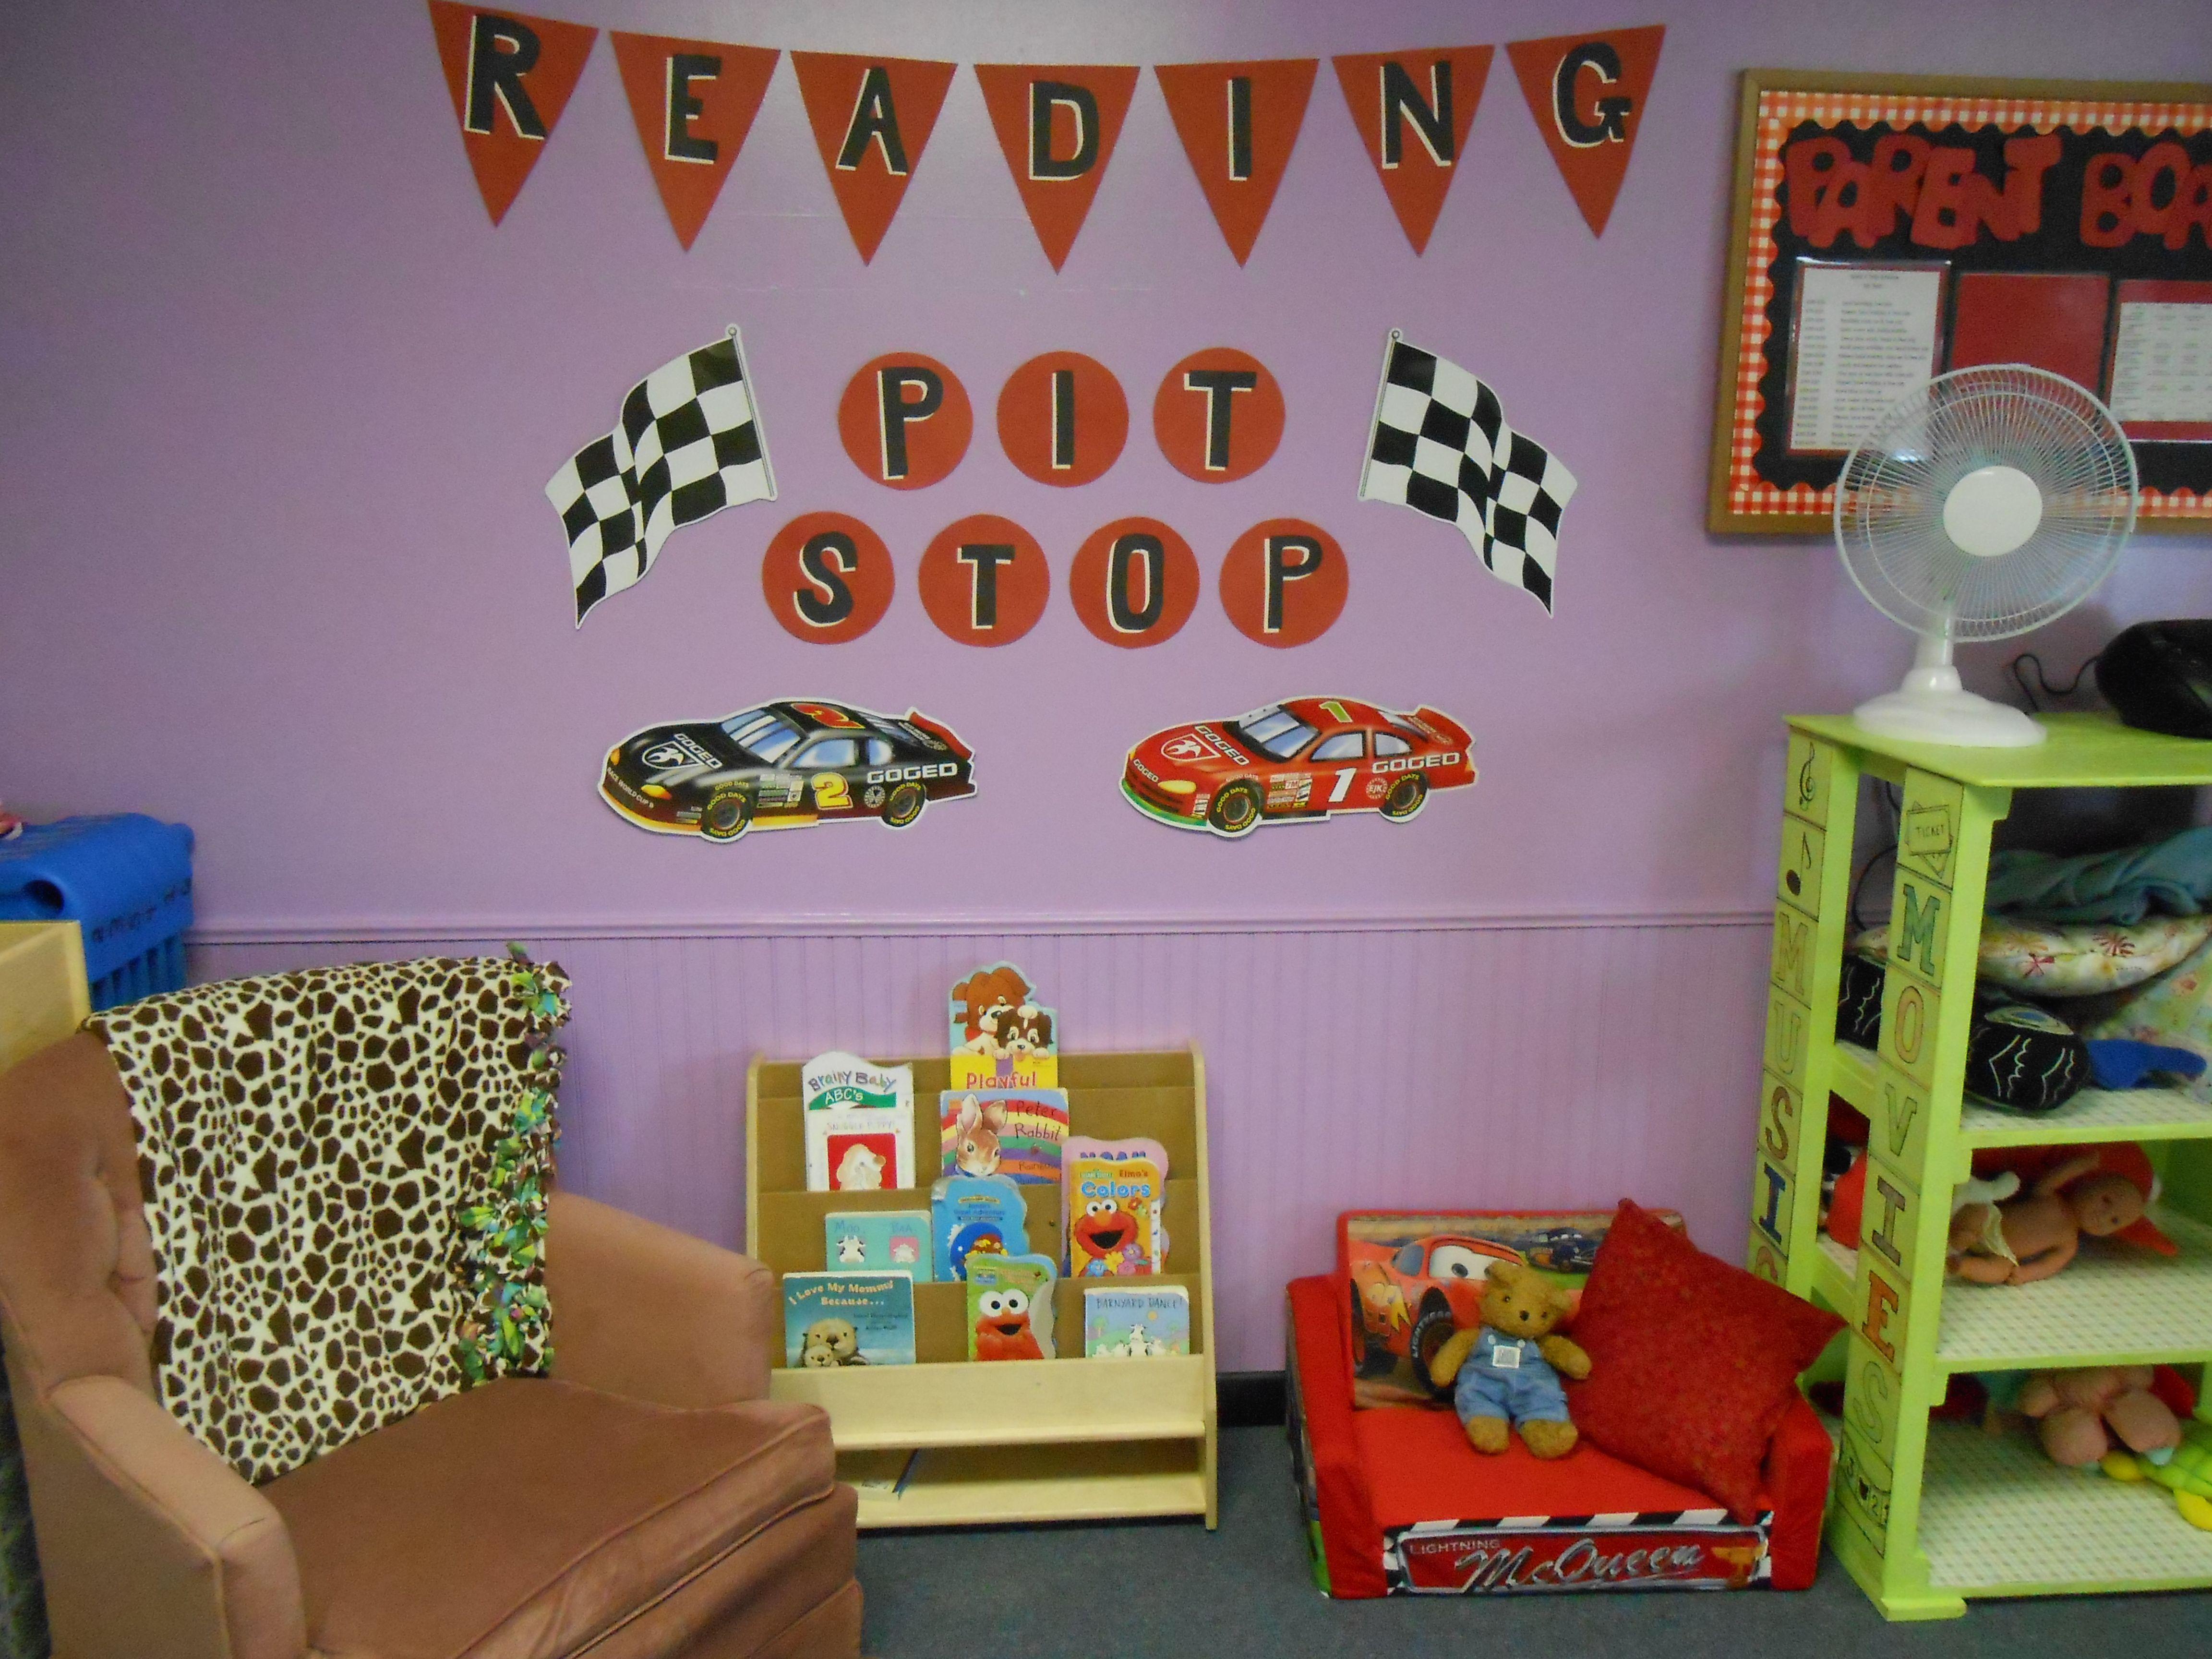 Daycare decor jpg - Cozy Center Or Book Center For Toddler Preschool Daycare Classroom